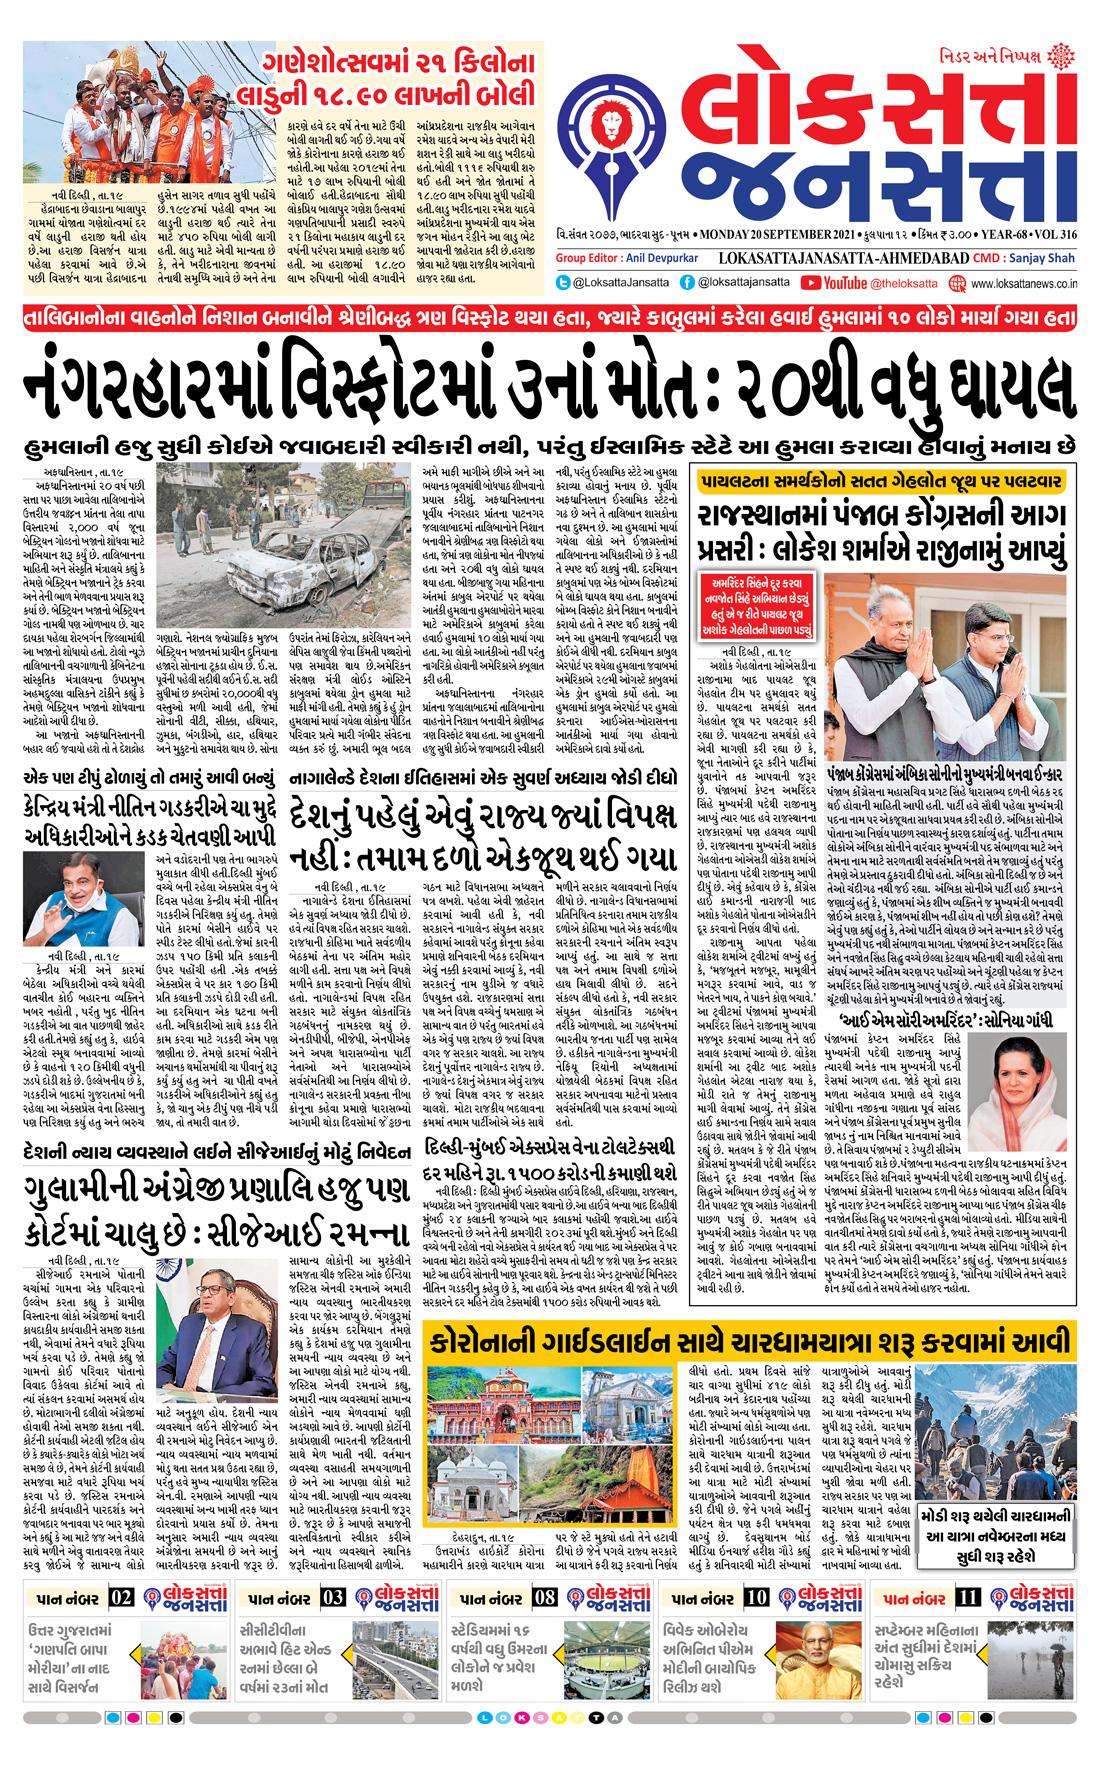 Loksatta Jansatta News Papaer E-paper dated 2021-09-20 | Page 1